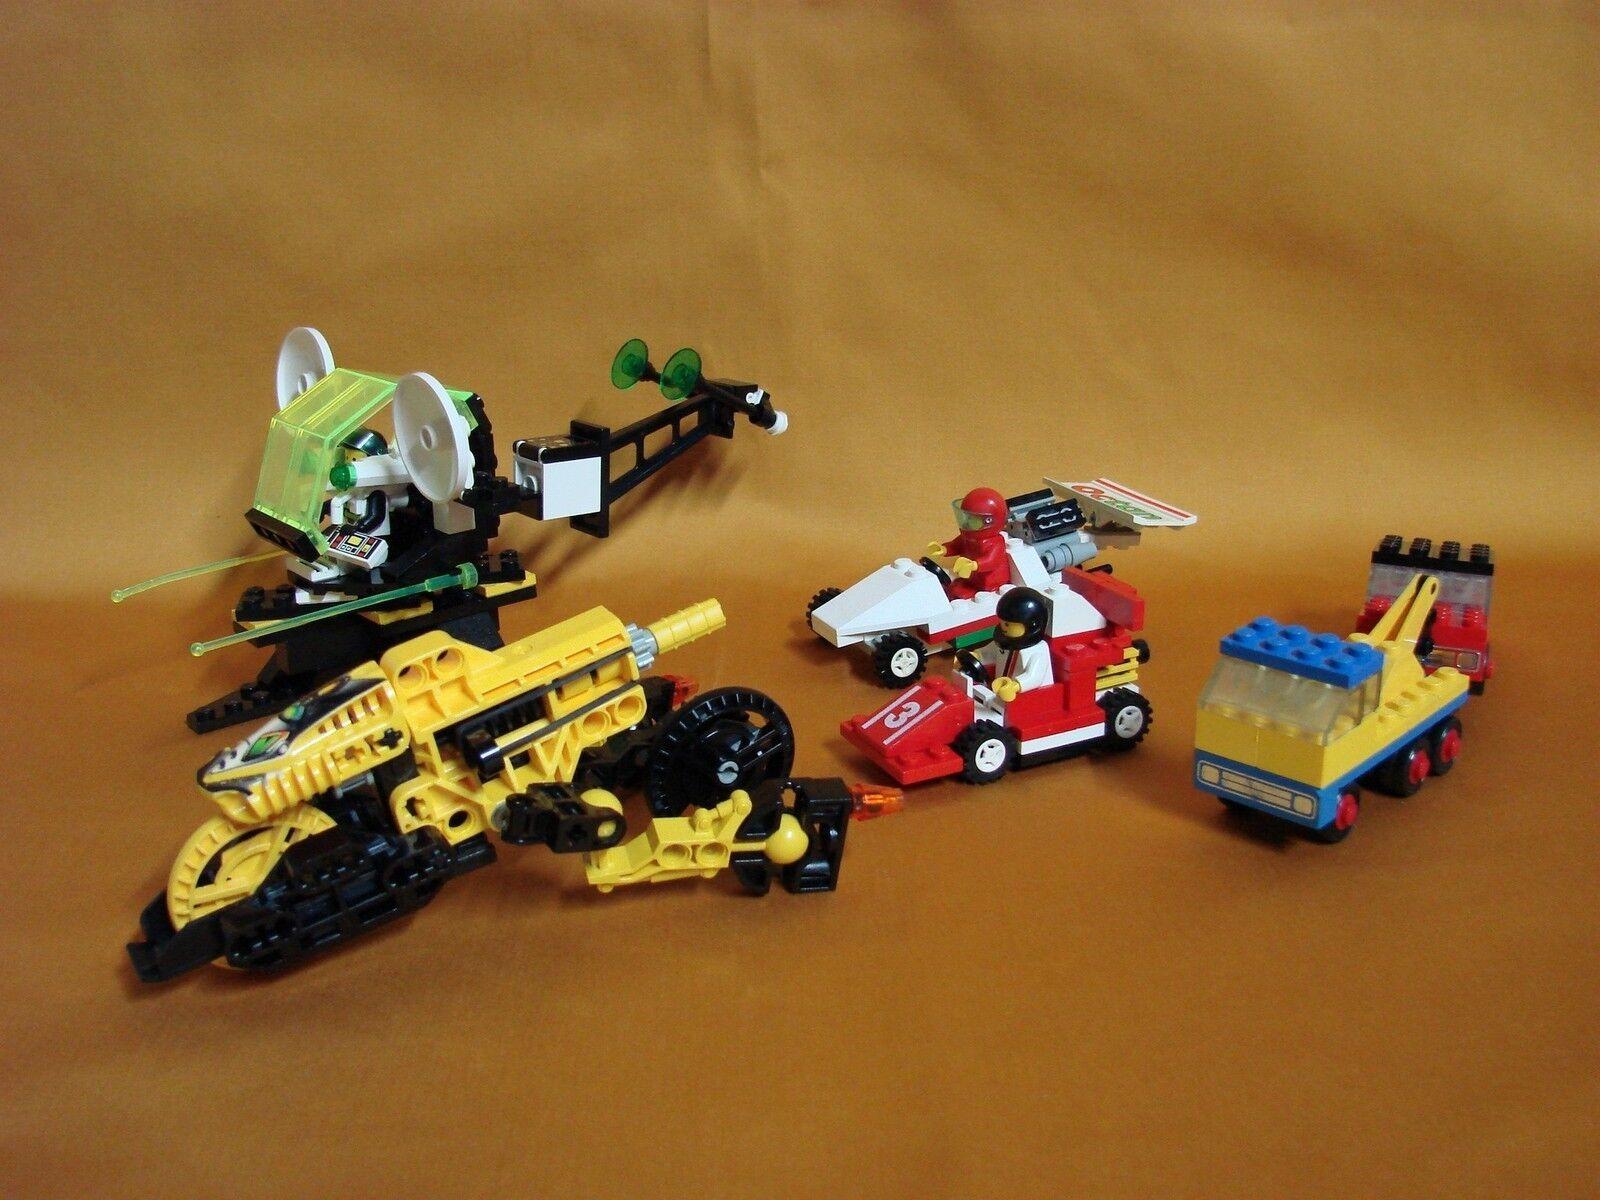 Los LEGO Ref 651 / 1890 / 6509 / 6878 / 8514 / TECHNIK System Spielzeug